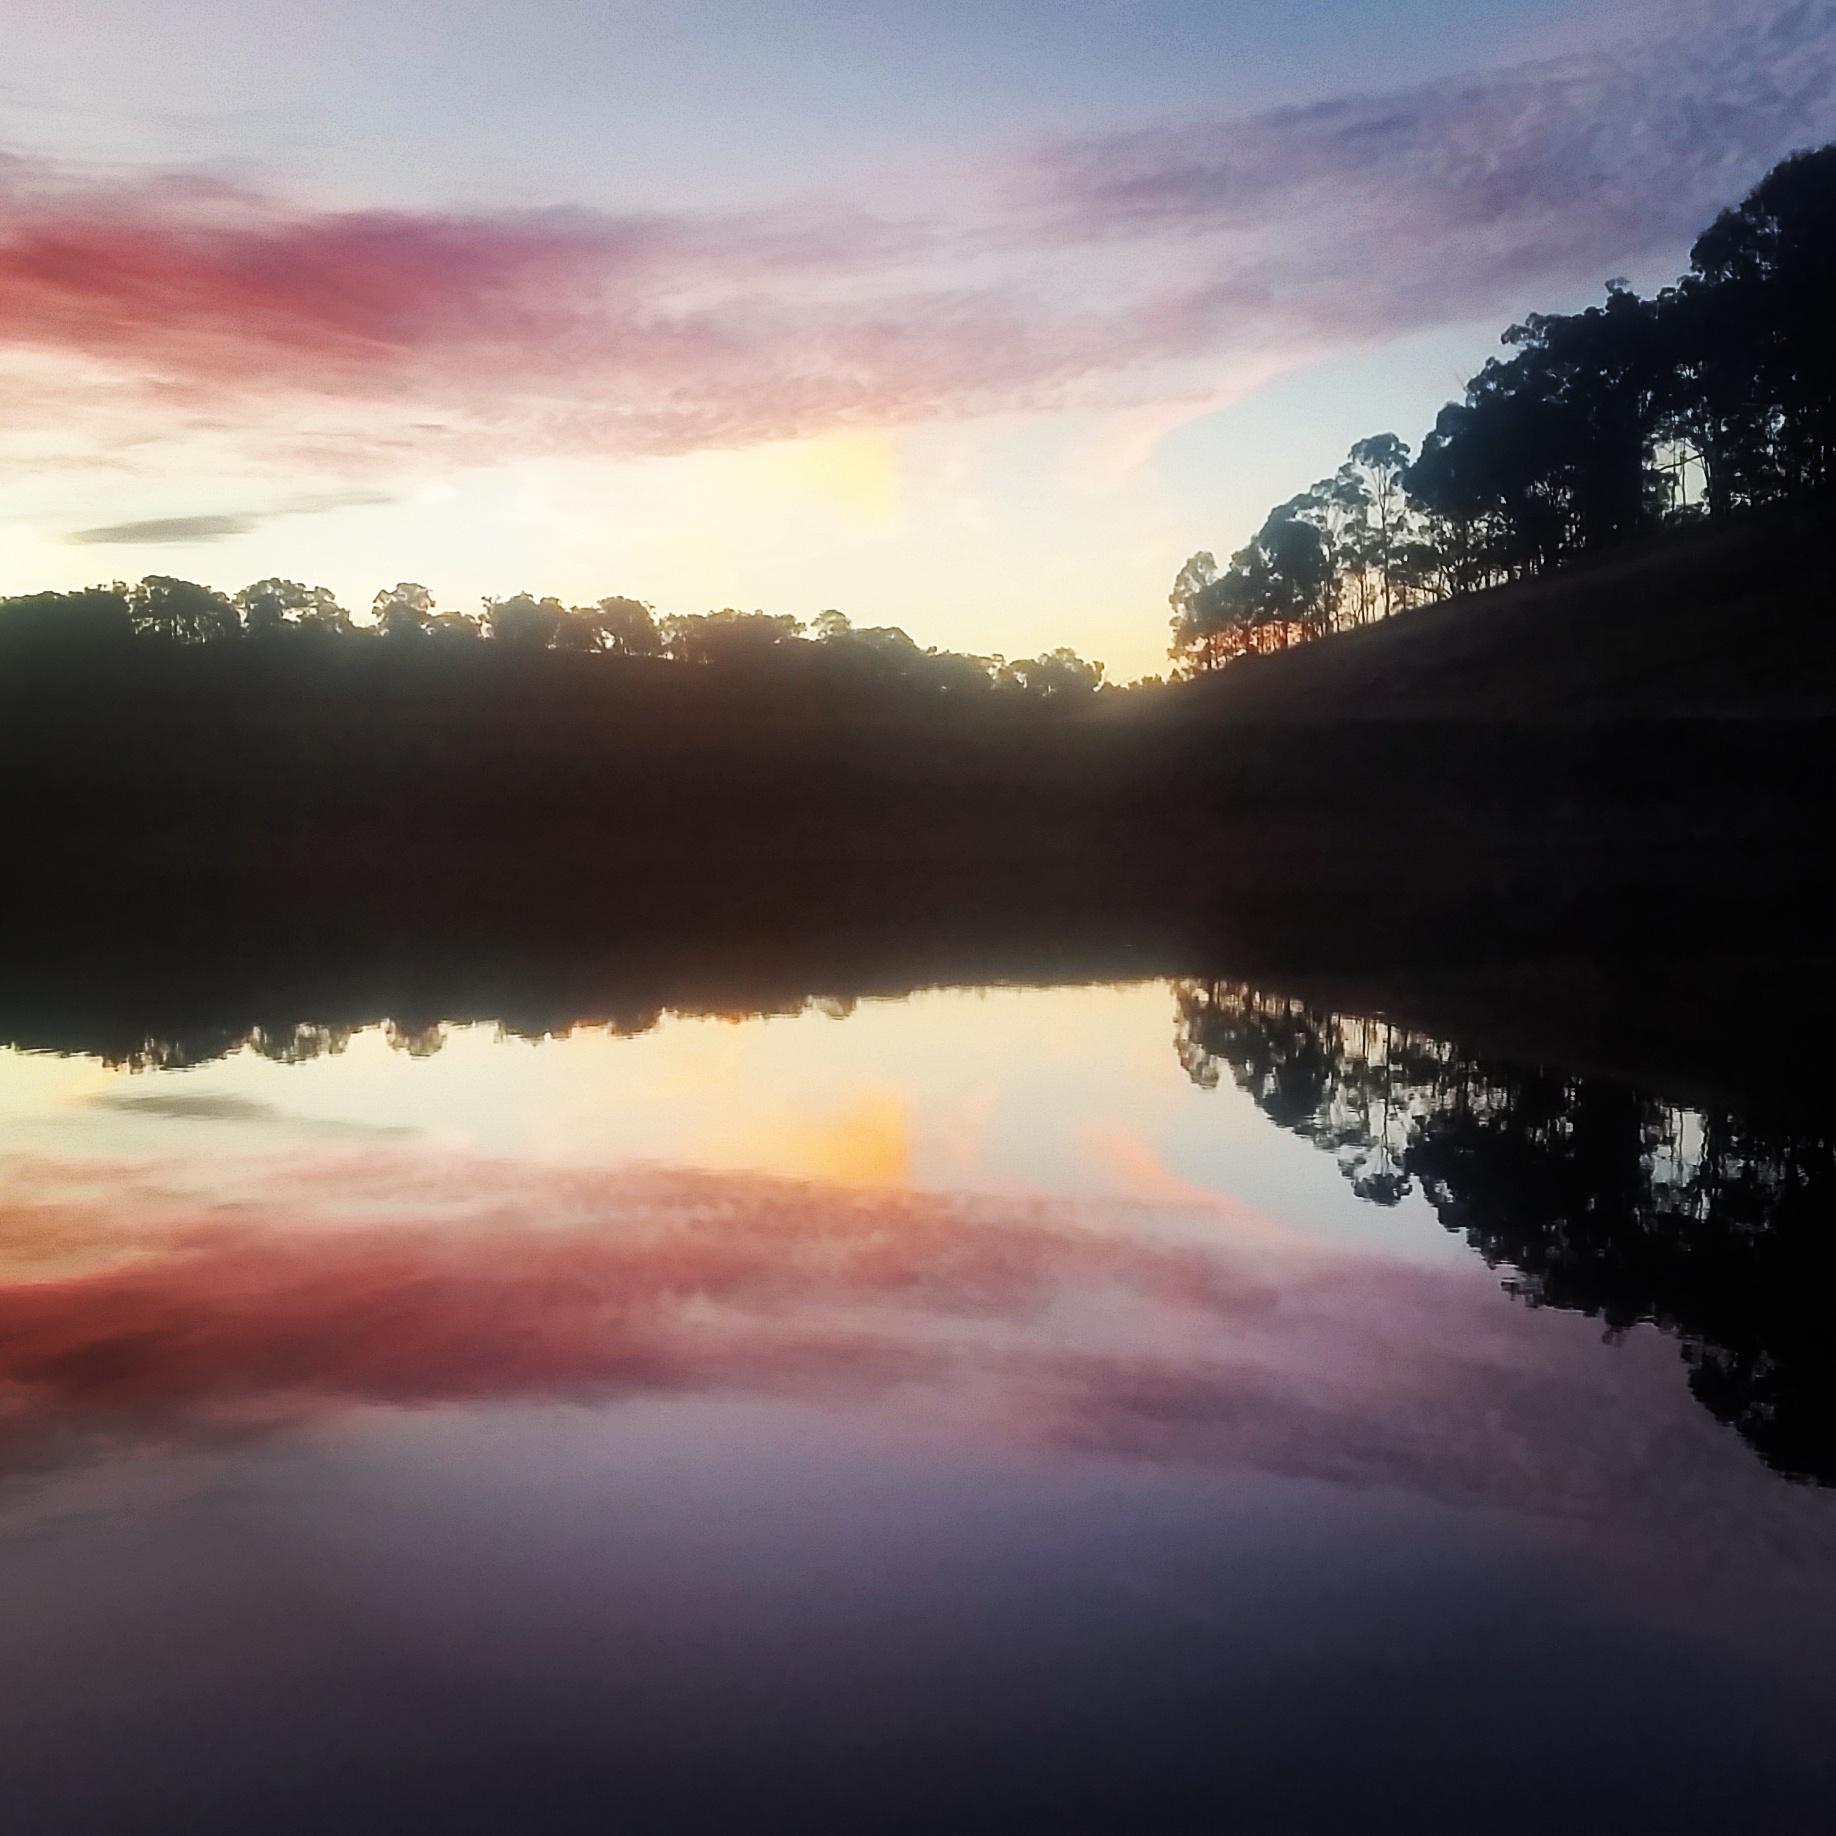 Dam at Sunset